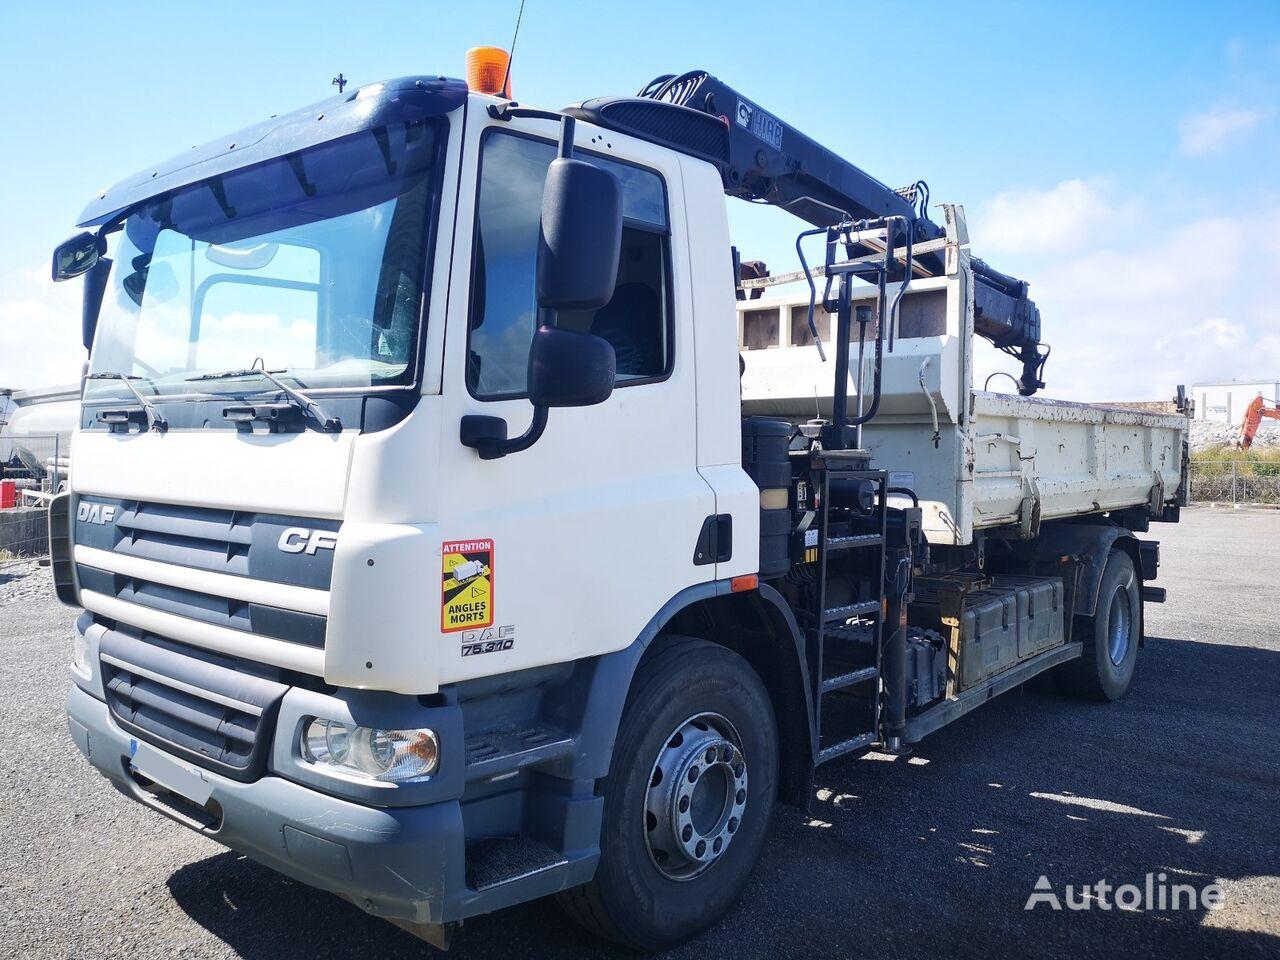 DAF CF 75.310 Bi-Kipper + KRAN HIAB 166 b-3 EURO 5 dump truck